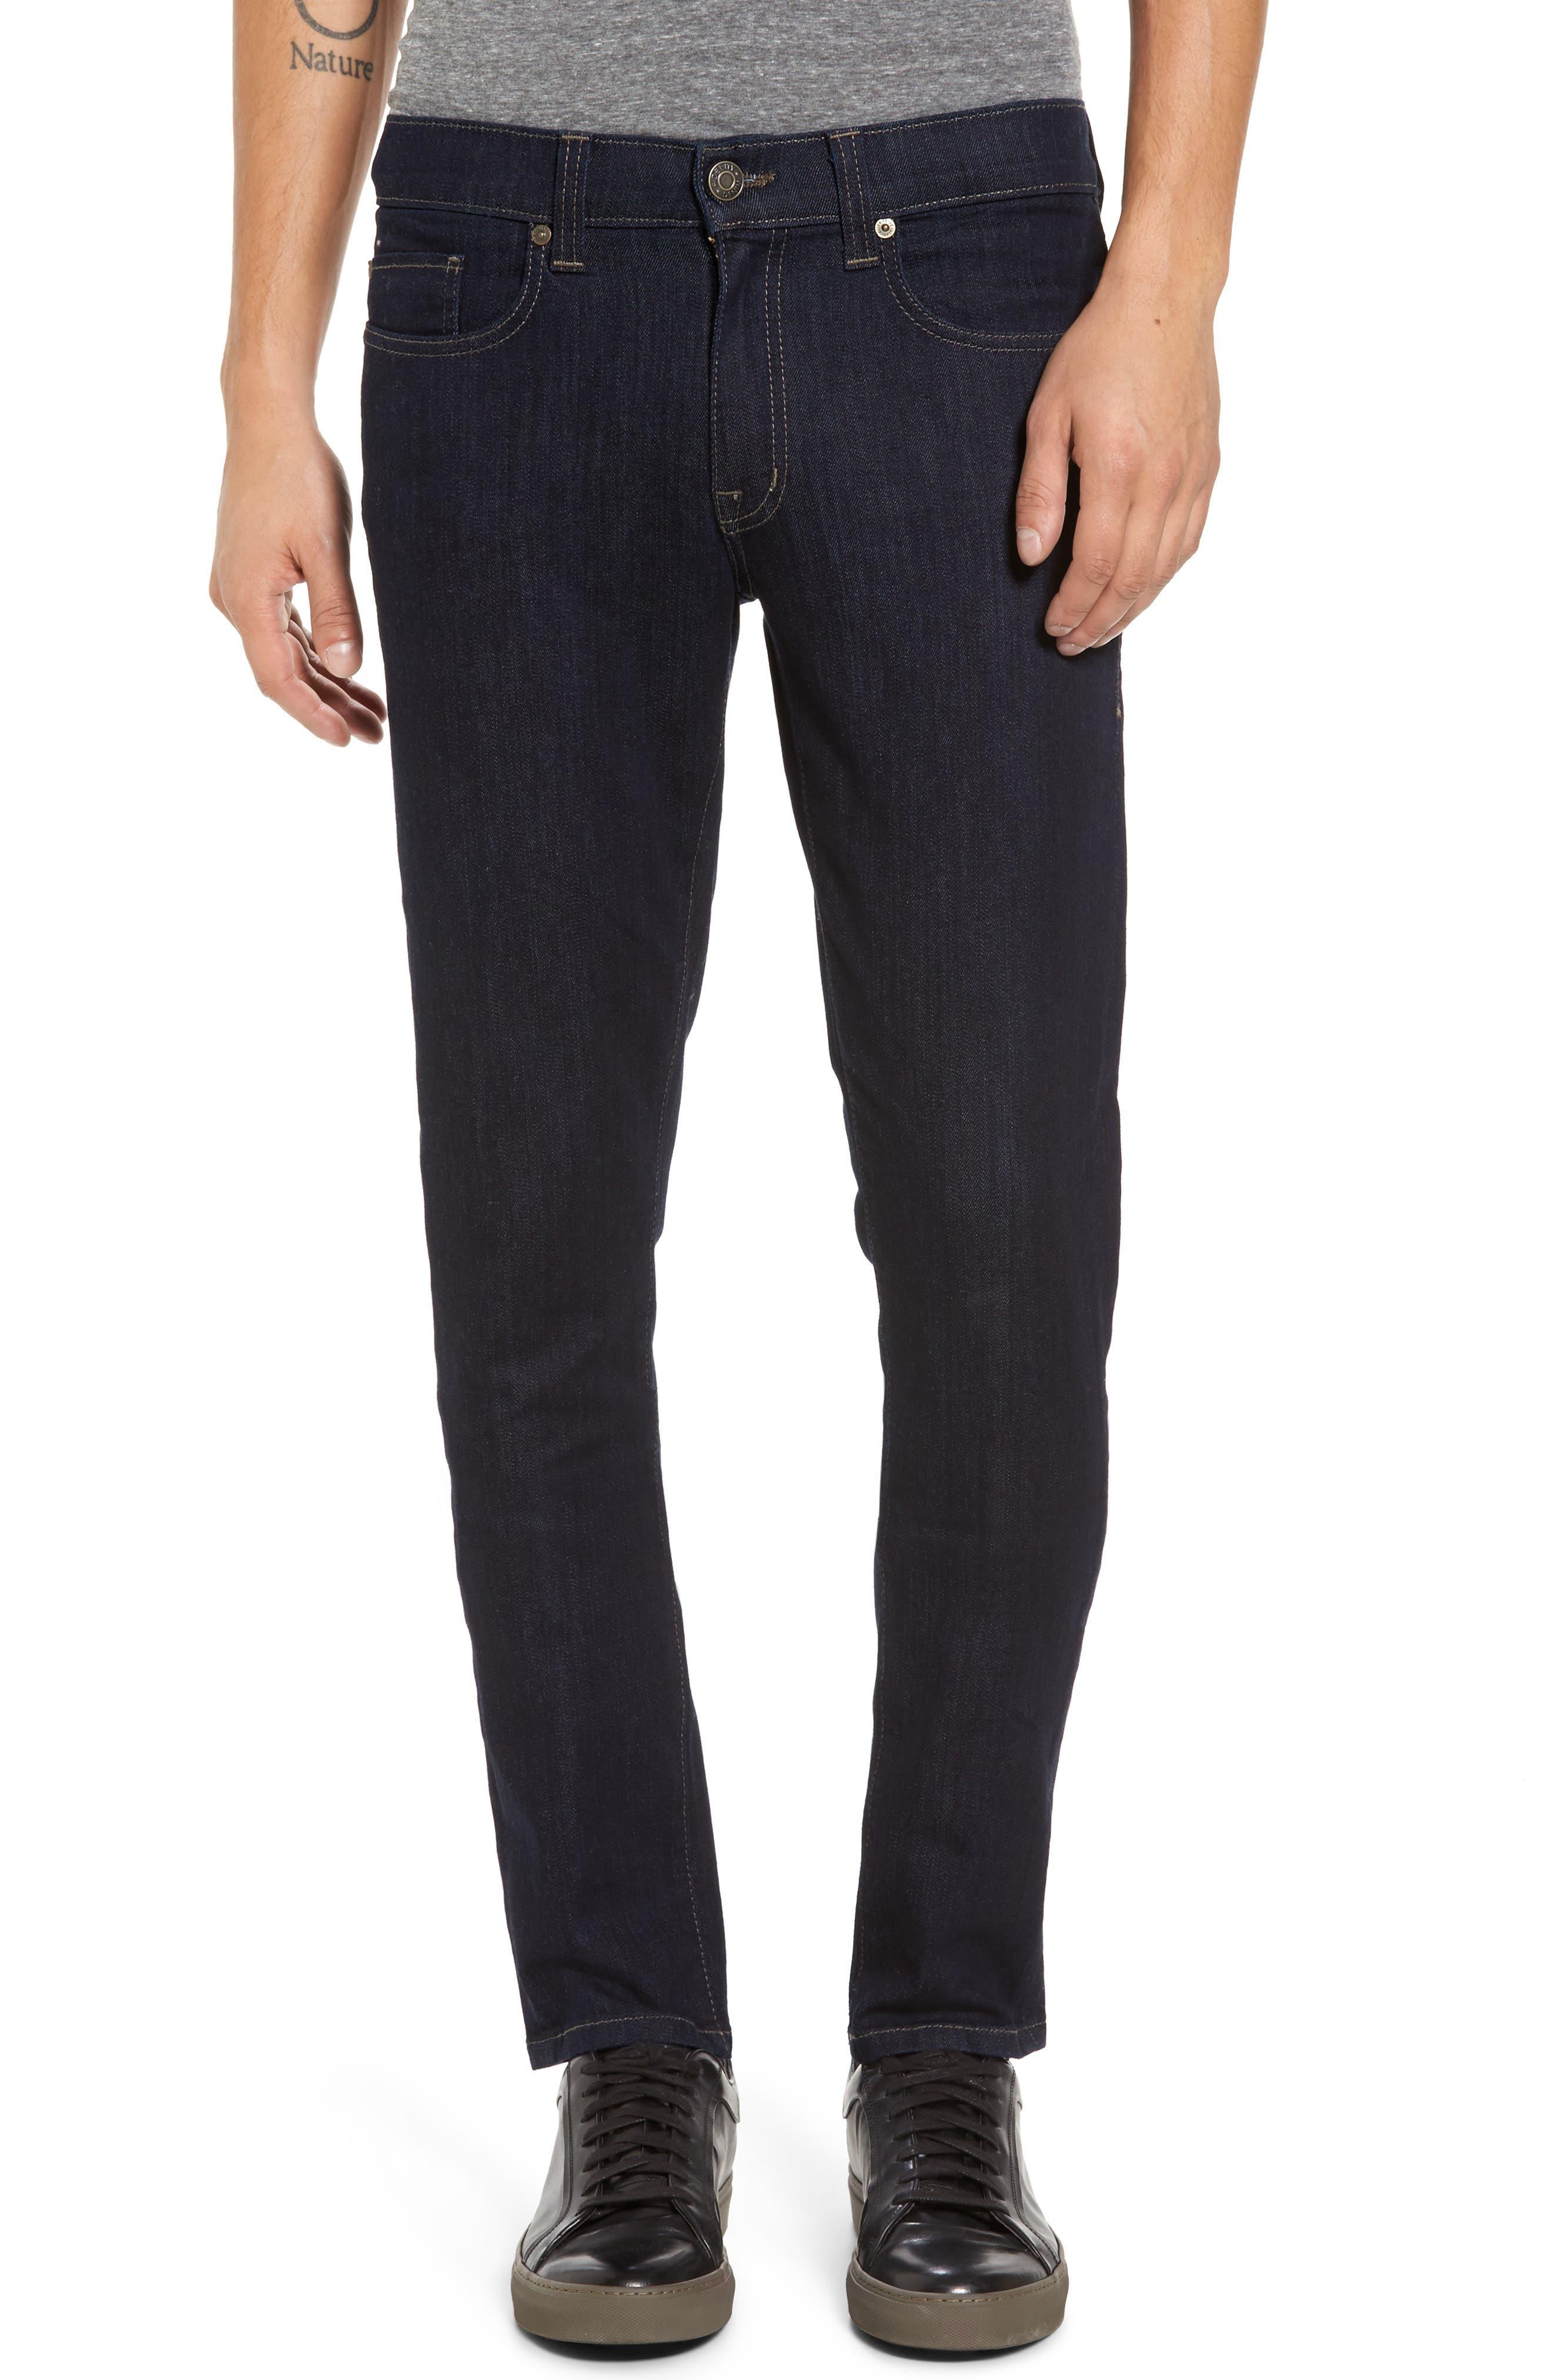 Vantage Skinny Fit Jeans,                         Main,                         color,